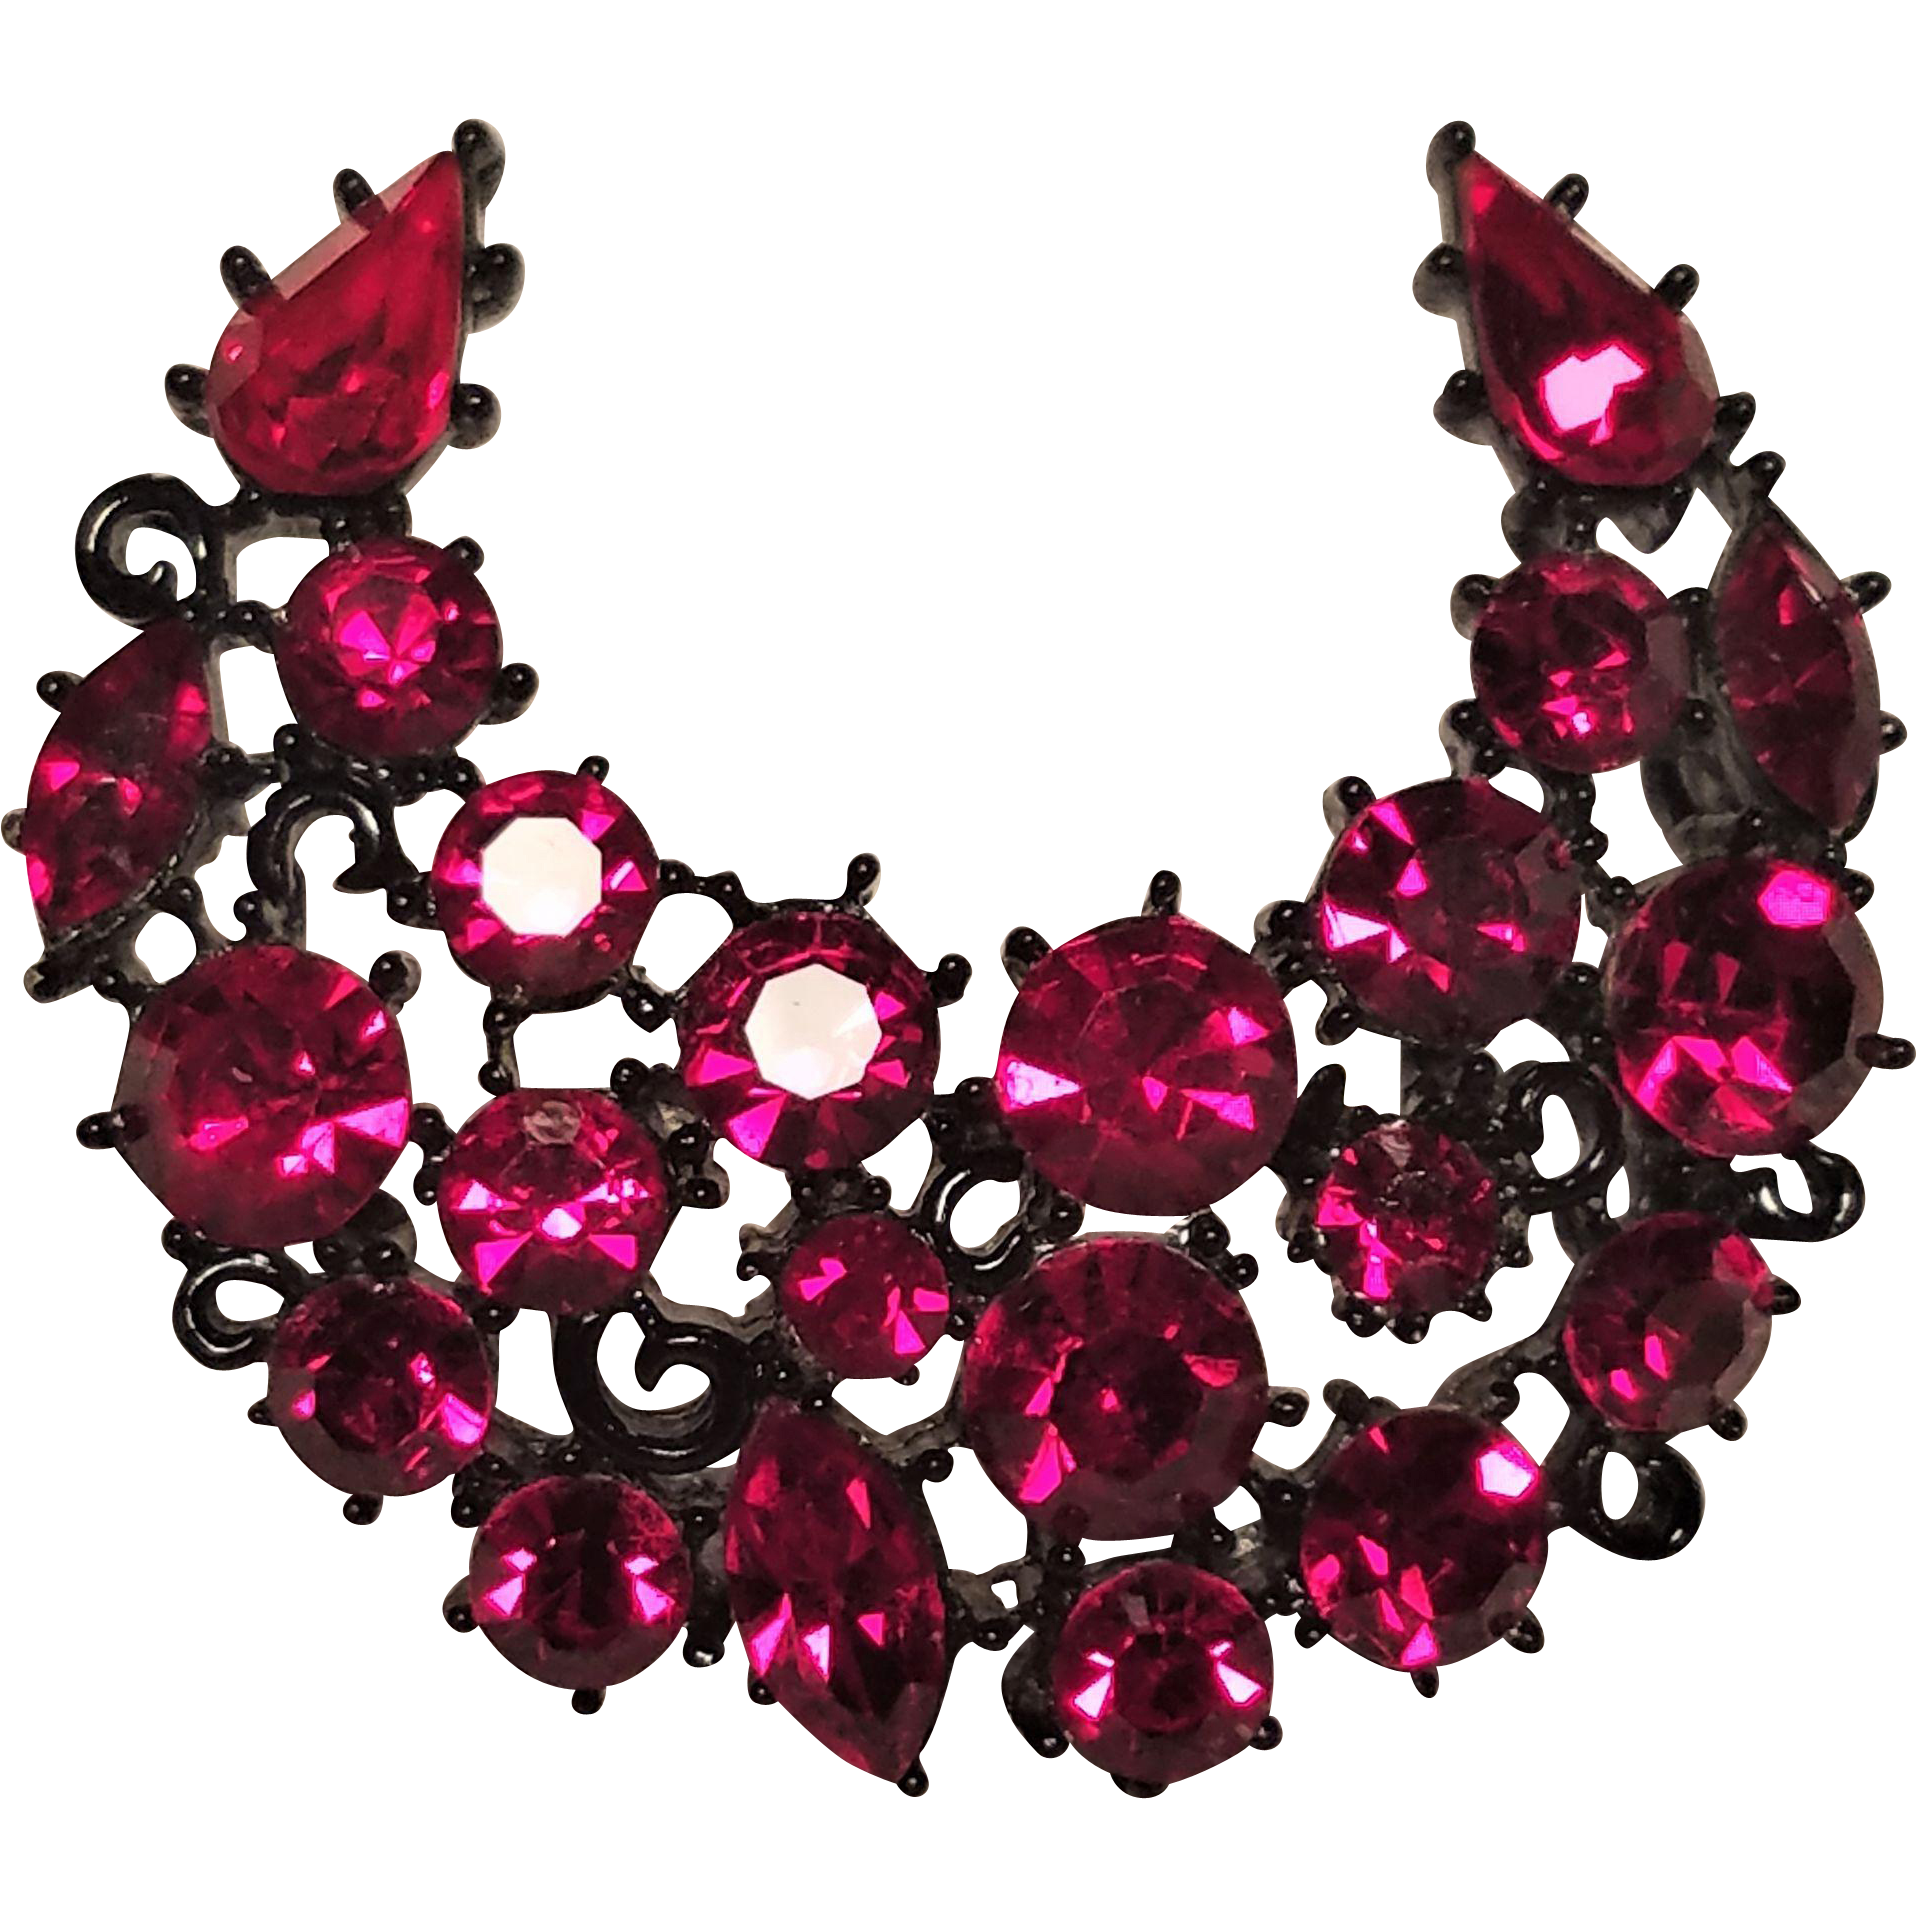 Jewel clipart vintage jewelry. Lisner red rhinestone crescent